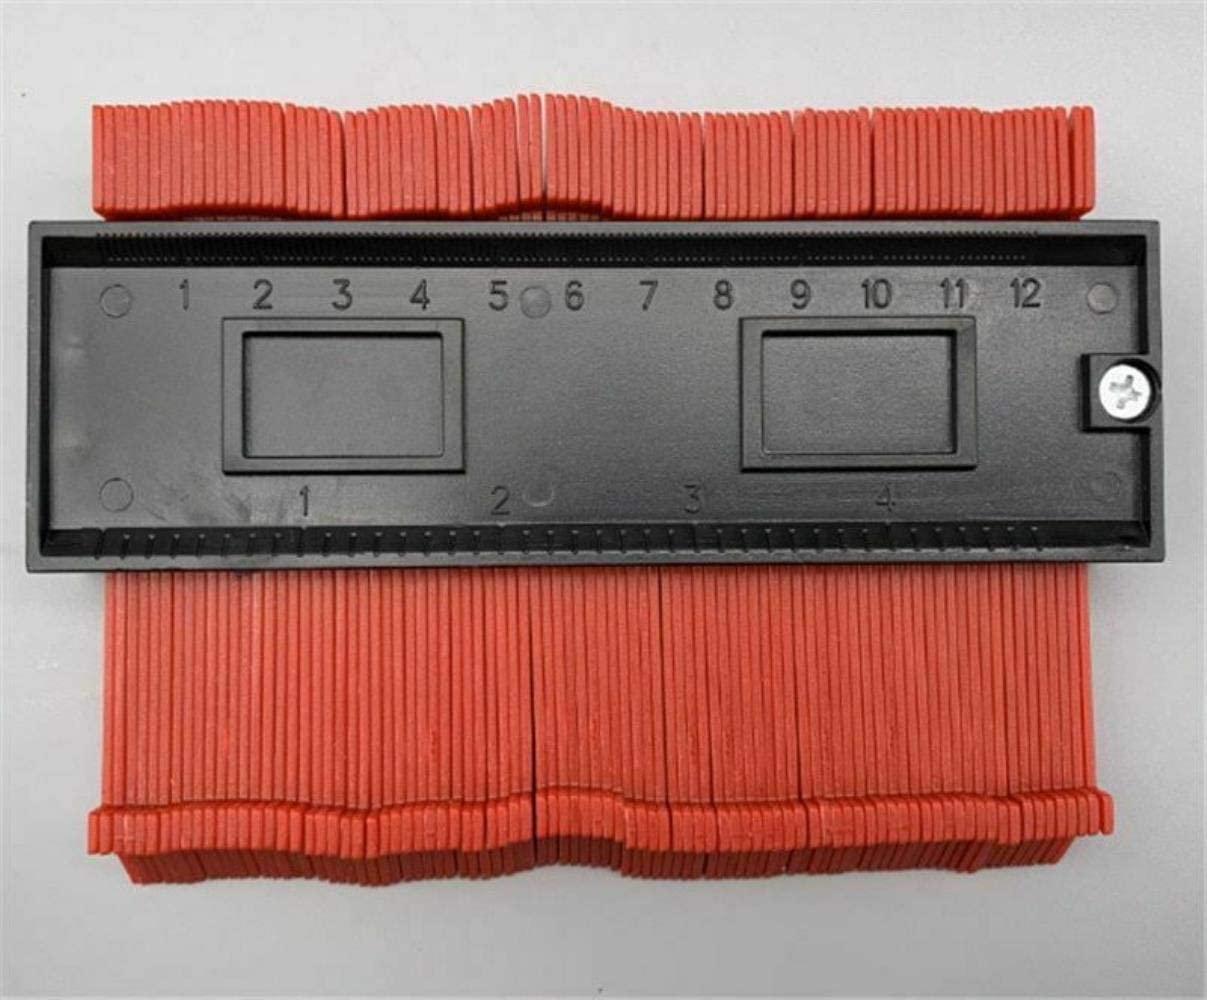 Contour Gauge,Wood Marking Tool Tiling Laminate Gauge Contour Profile Copy Gauge Duplicator,A